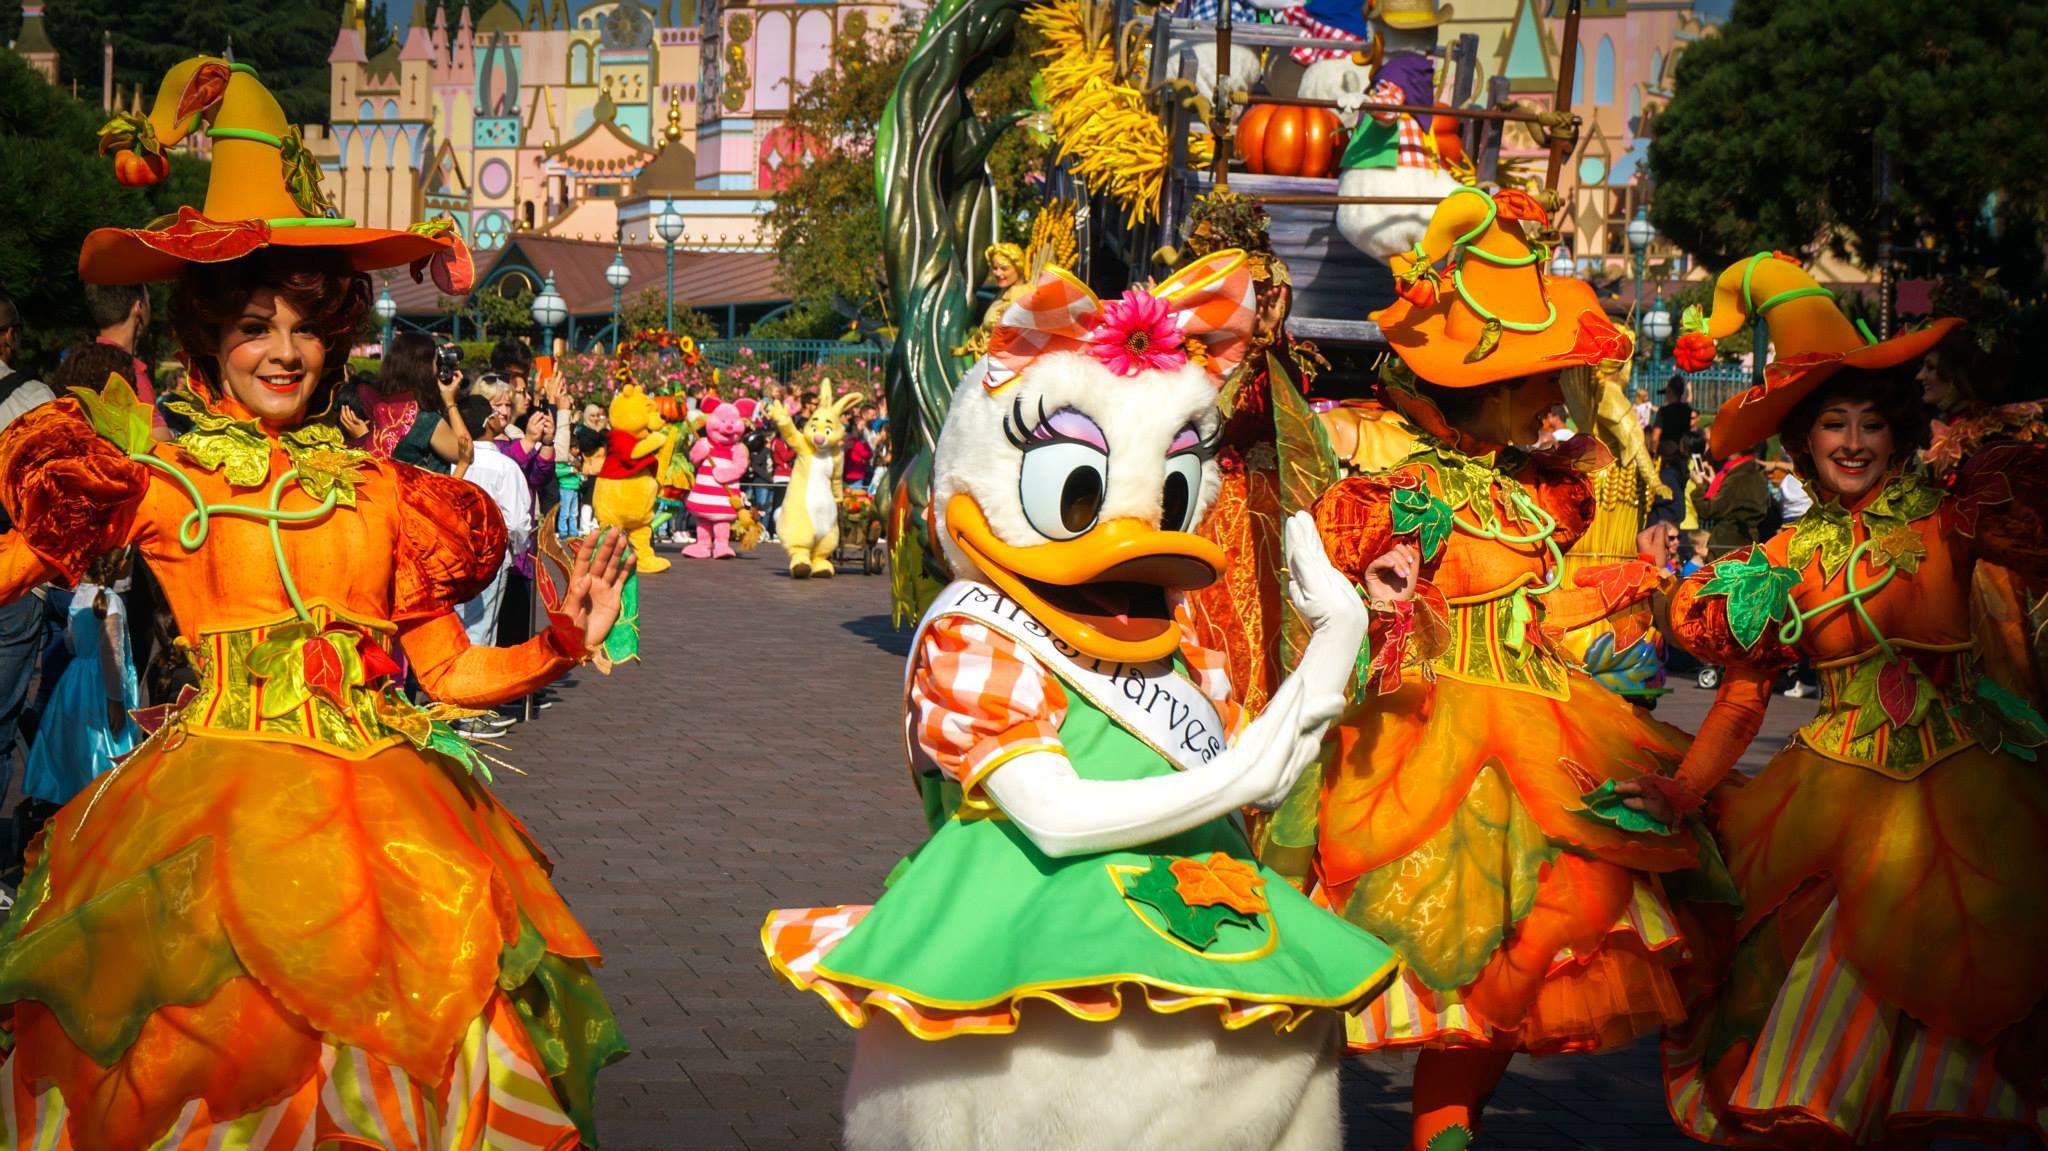 Mickey's Halloween Celebration Parade at Disneyland Paris